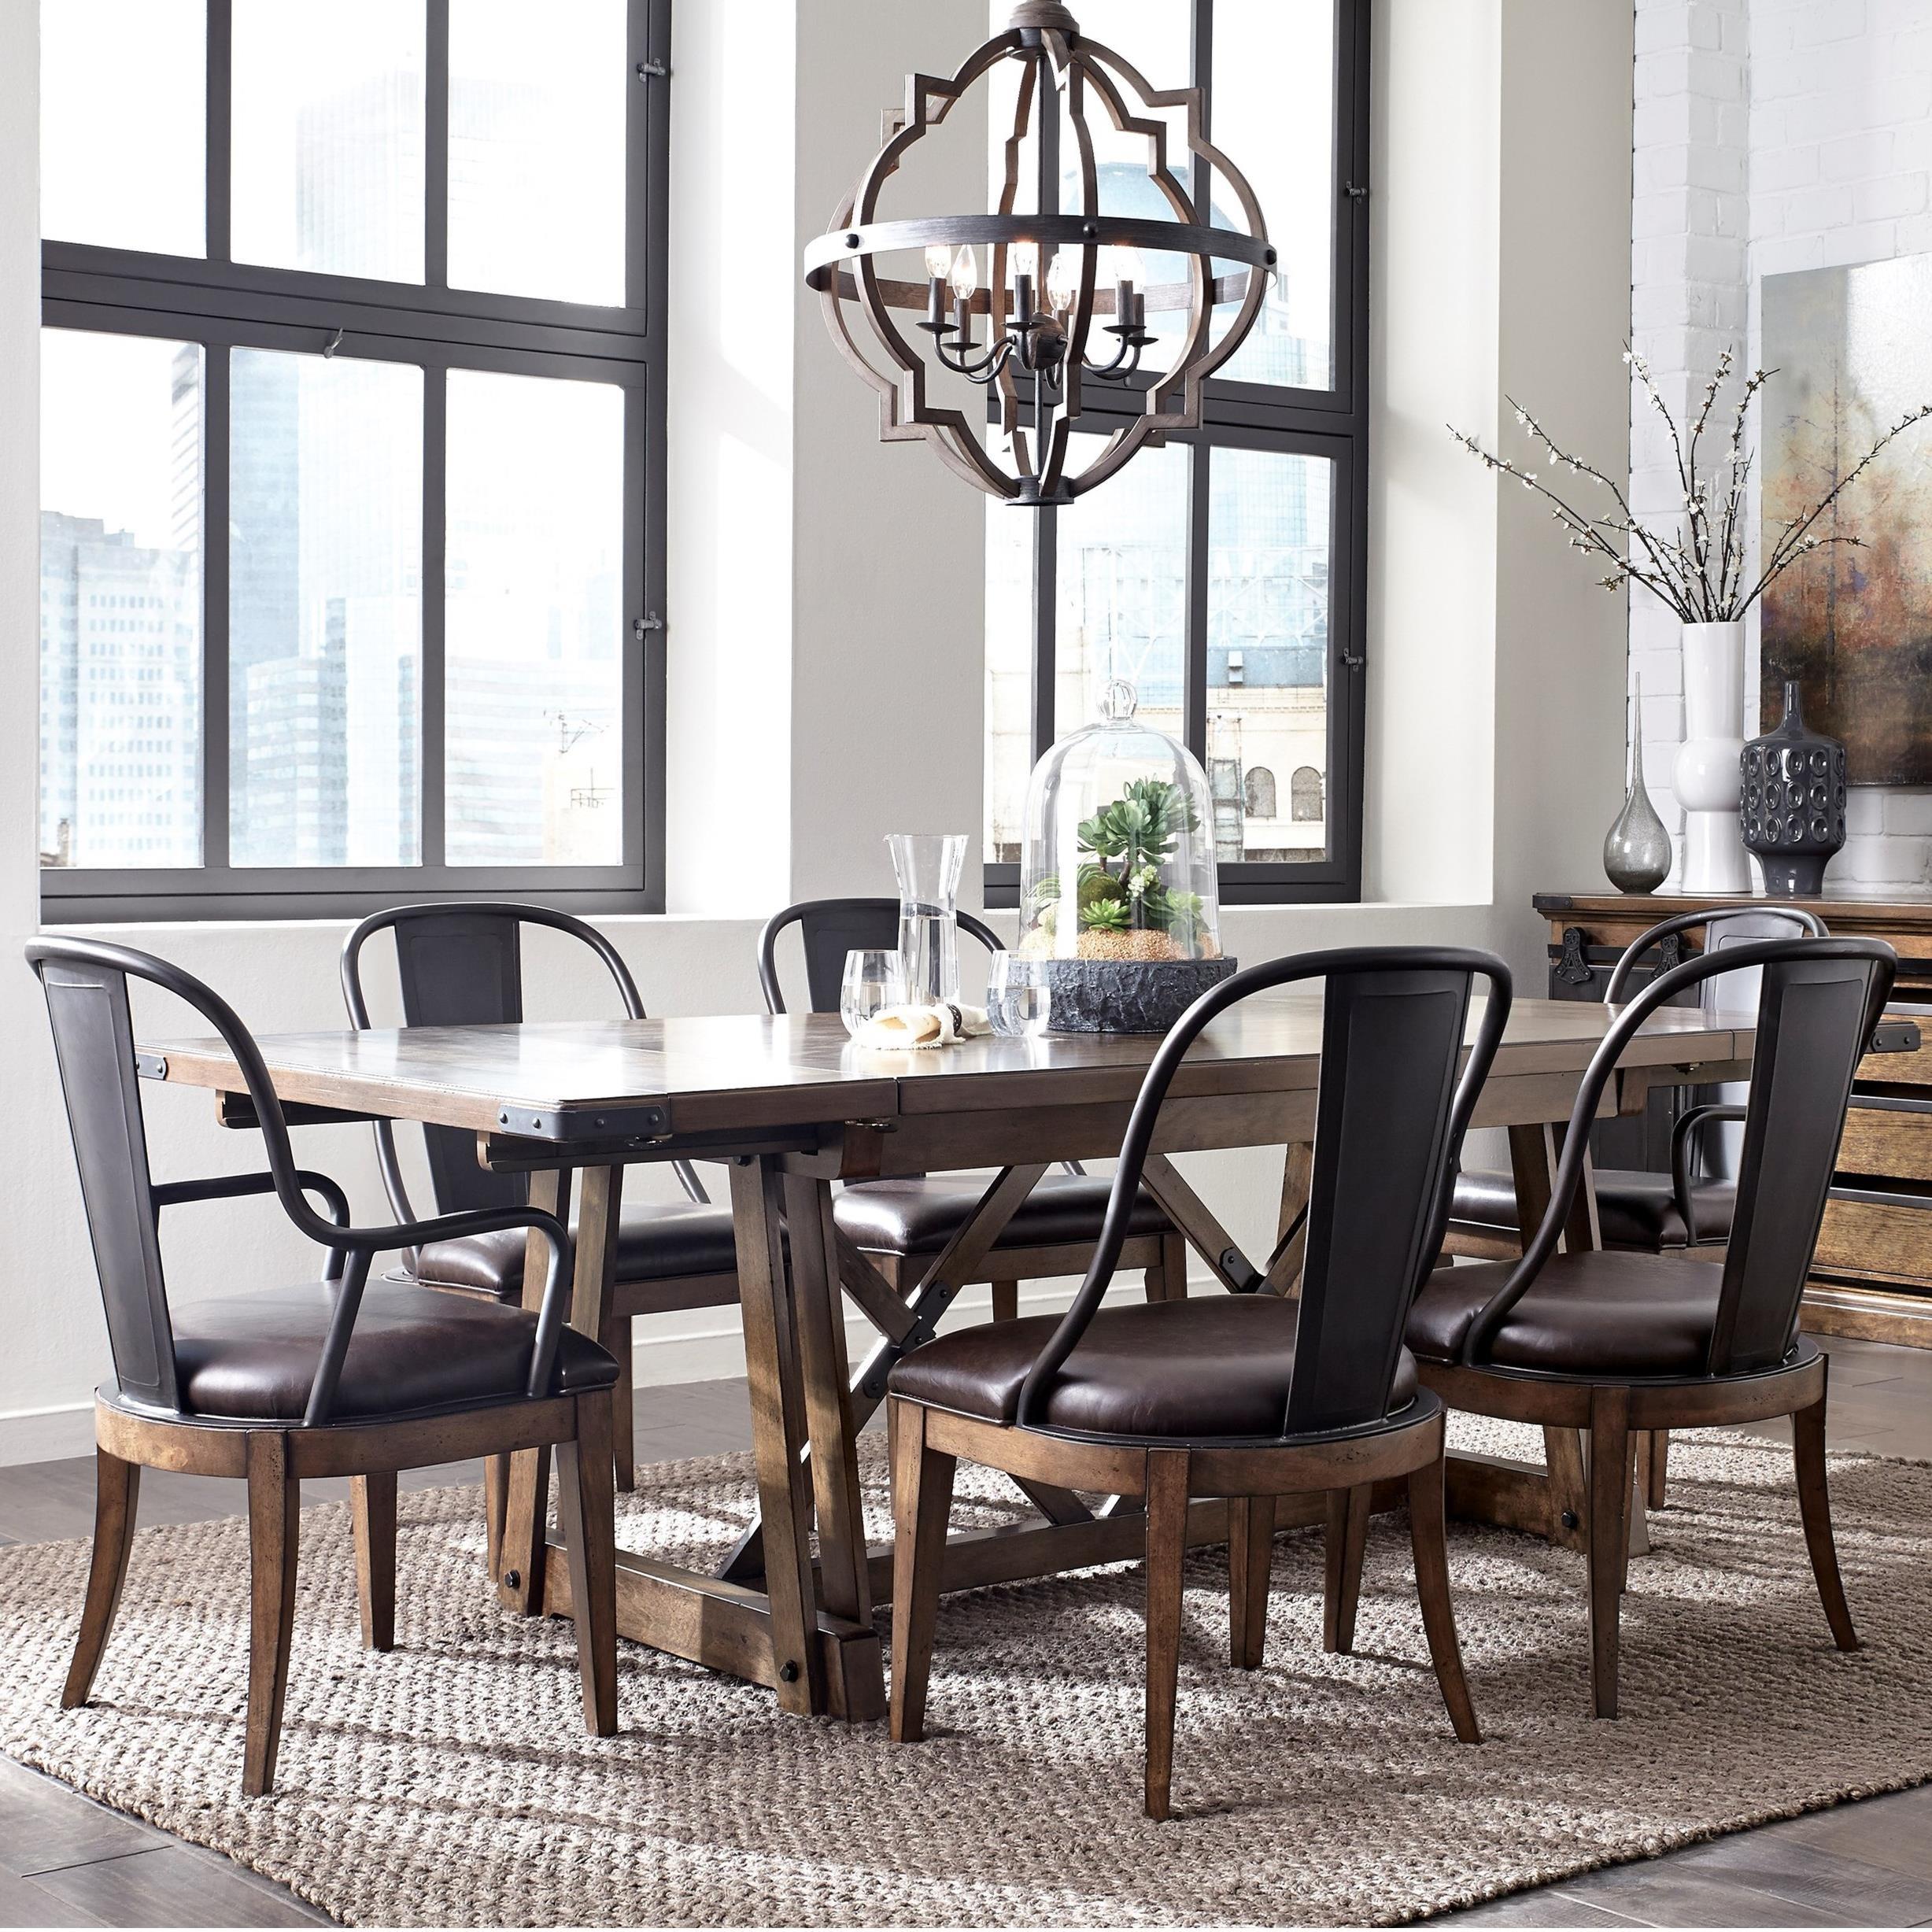 Superbe Pulaski Furniture Weston Loft 7 Piece Trestle Table And Metal Chair Set